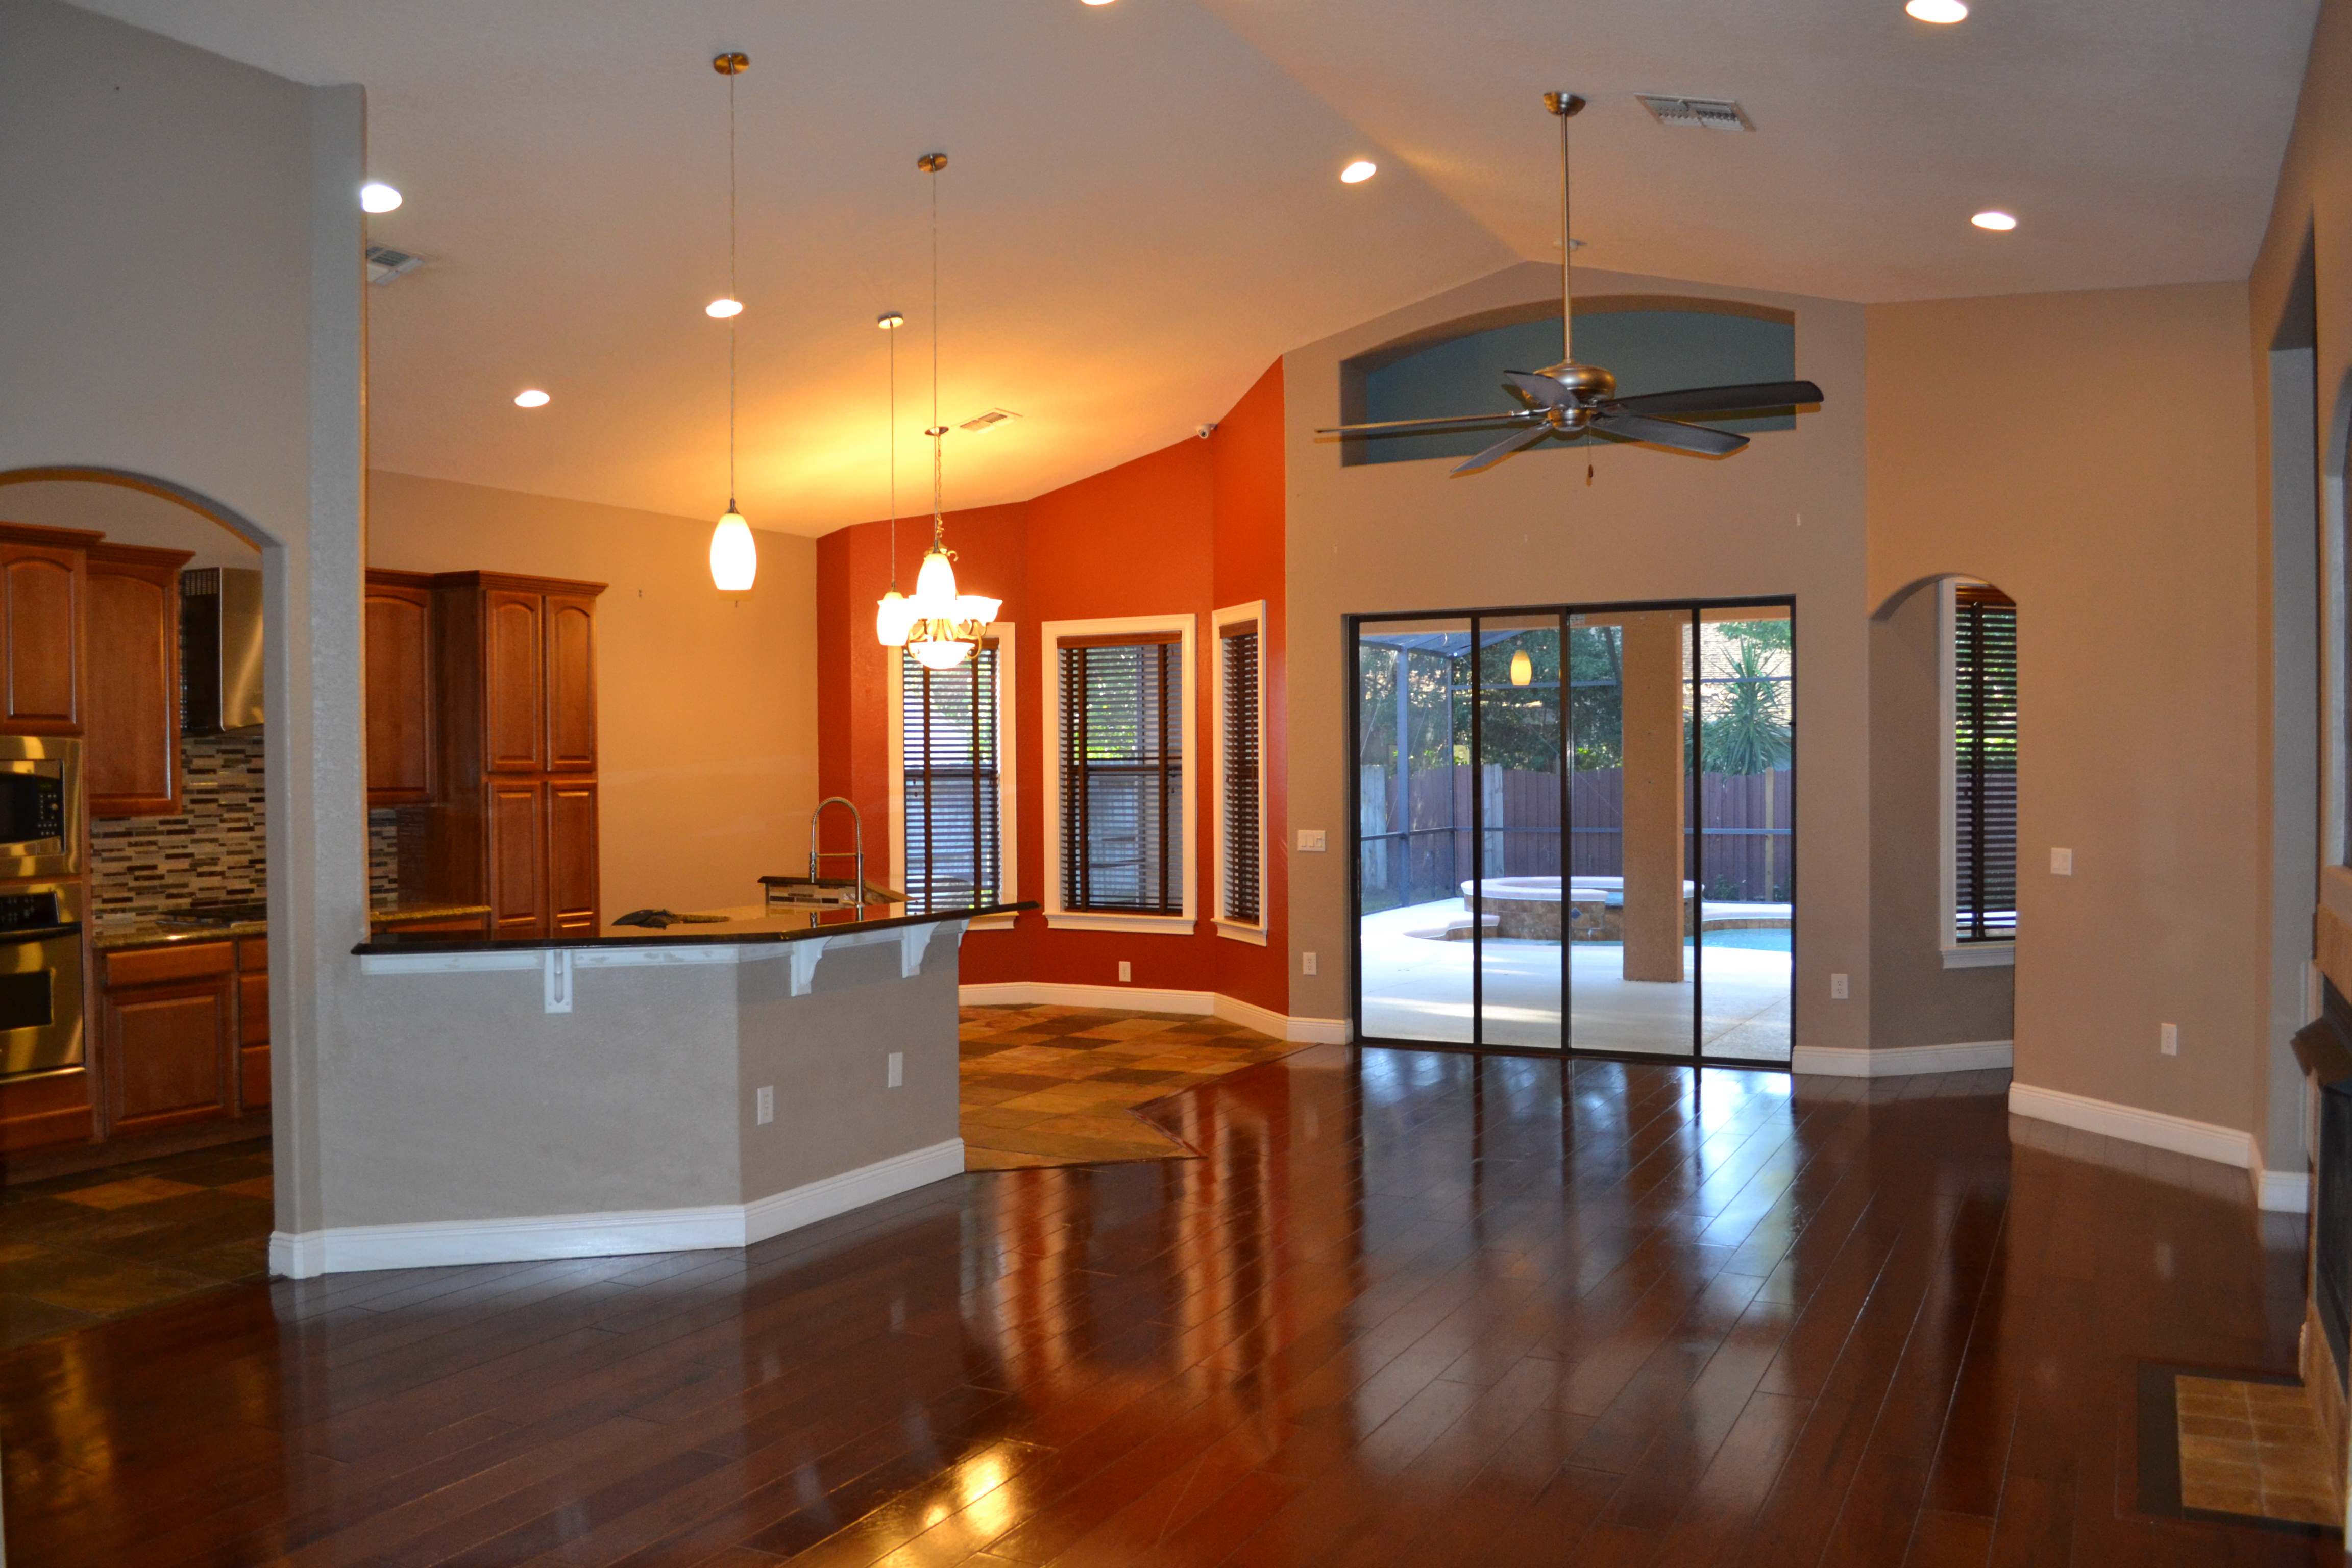 Photo of 461 Sanford Avenue, Longwood, FL, 32750